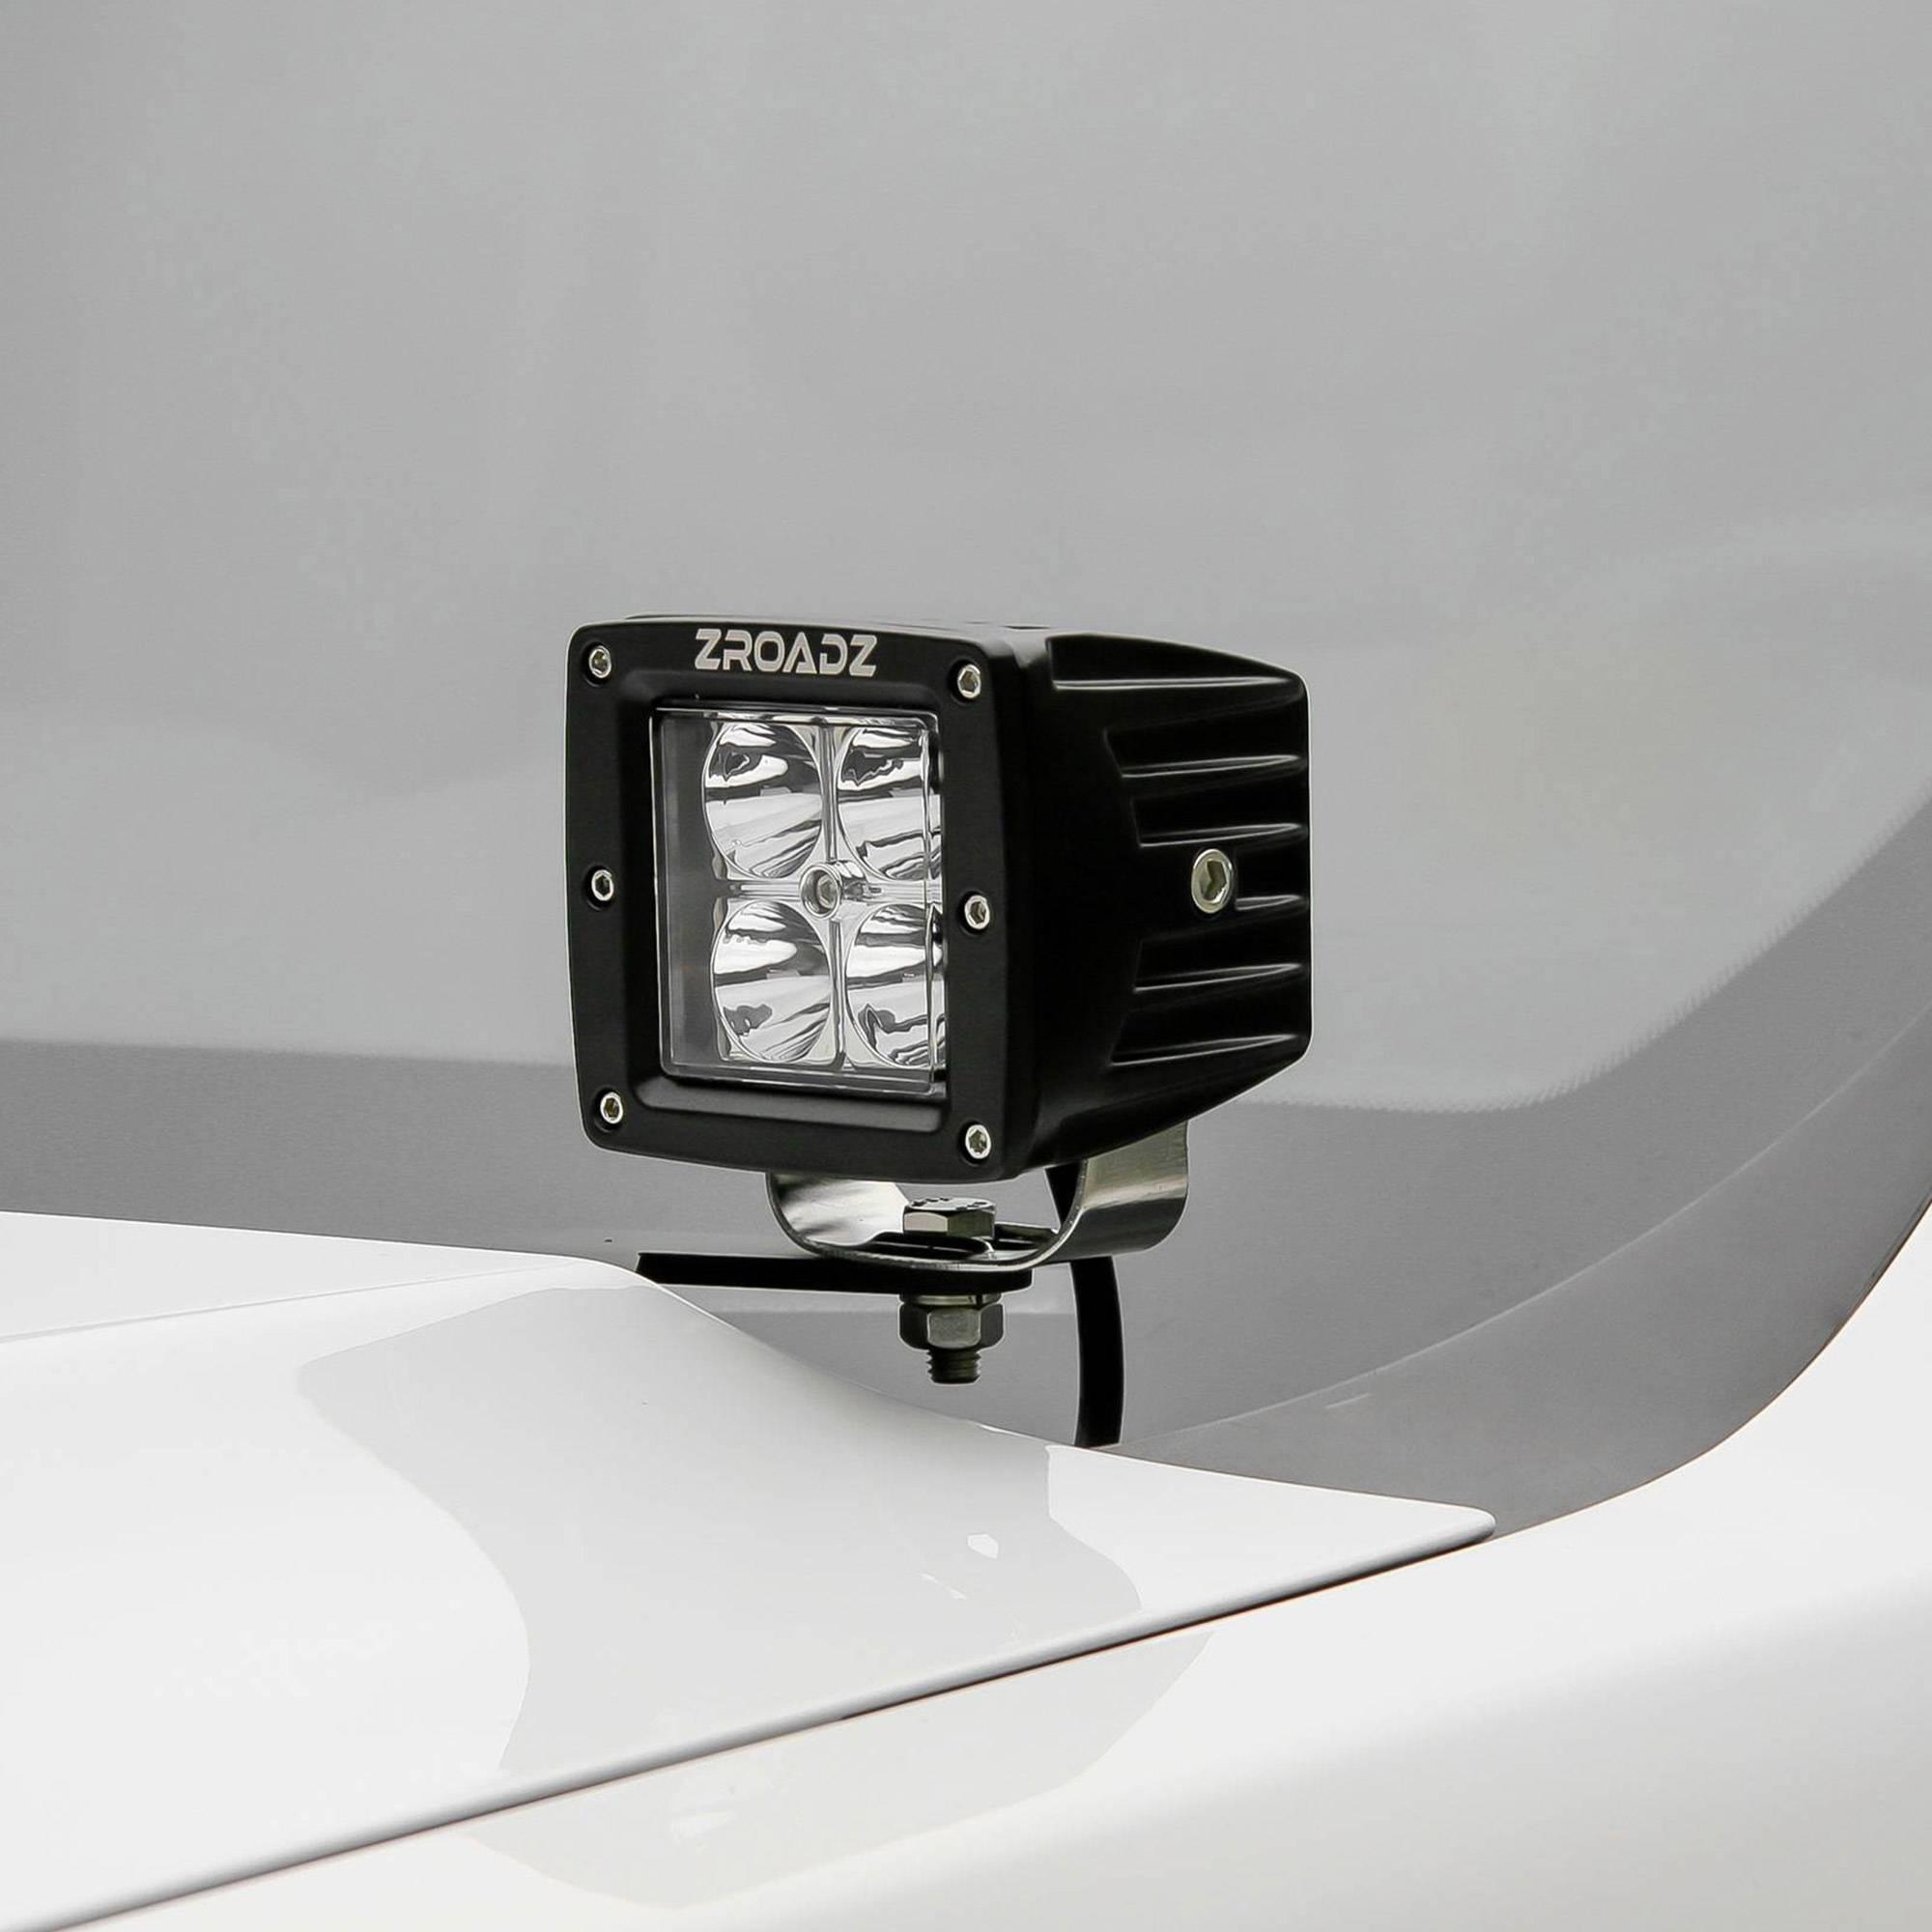 ZROADZ OFF ROAD PRODUCTS - 2008-2010 Ford Super Duty Hood Hinge LED Kit with (2) 3 Inch LED Pod Lights - PN #Z365631-KIT2